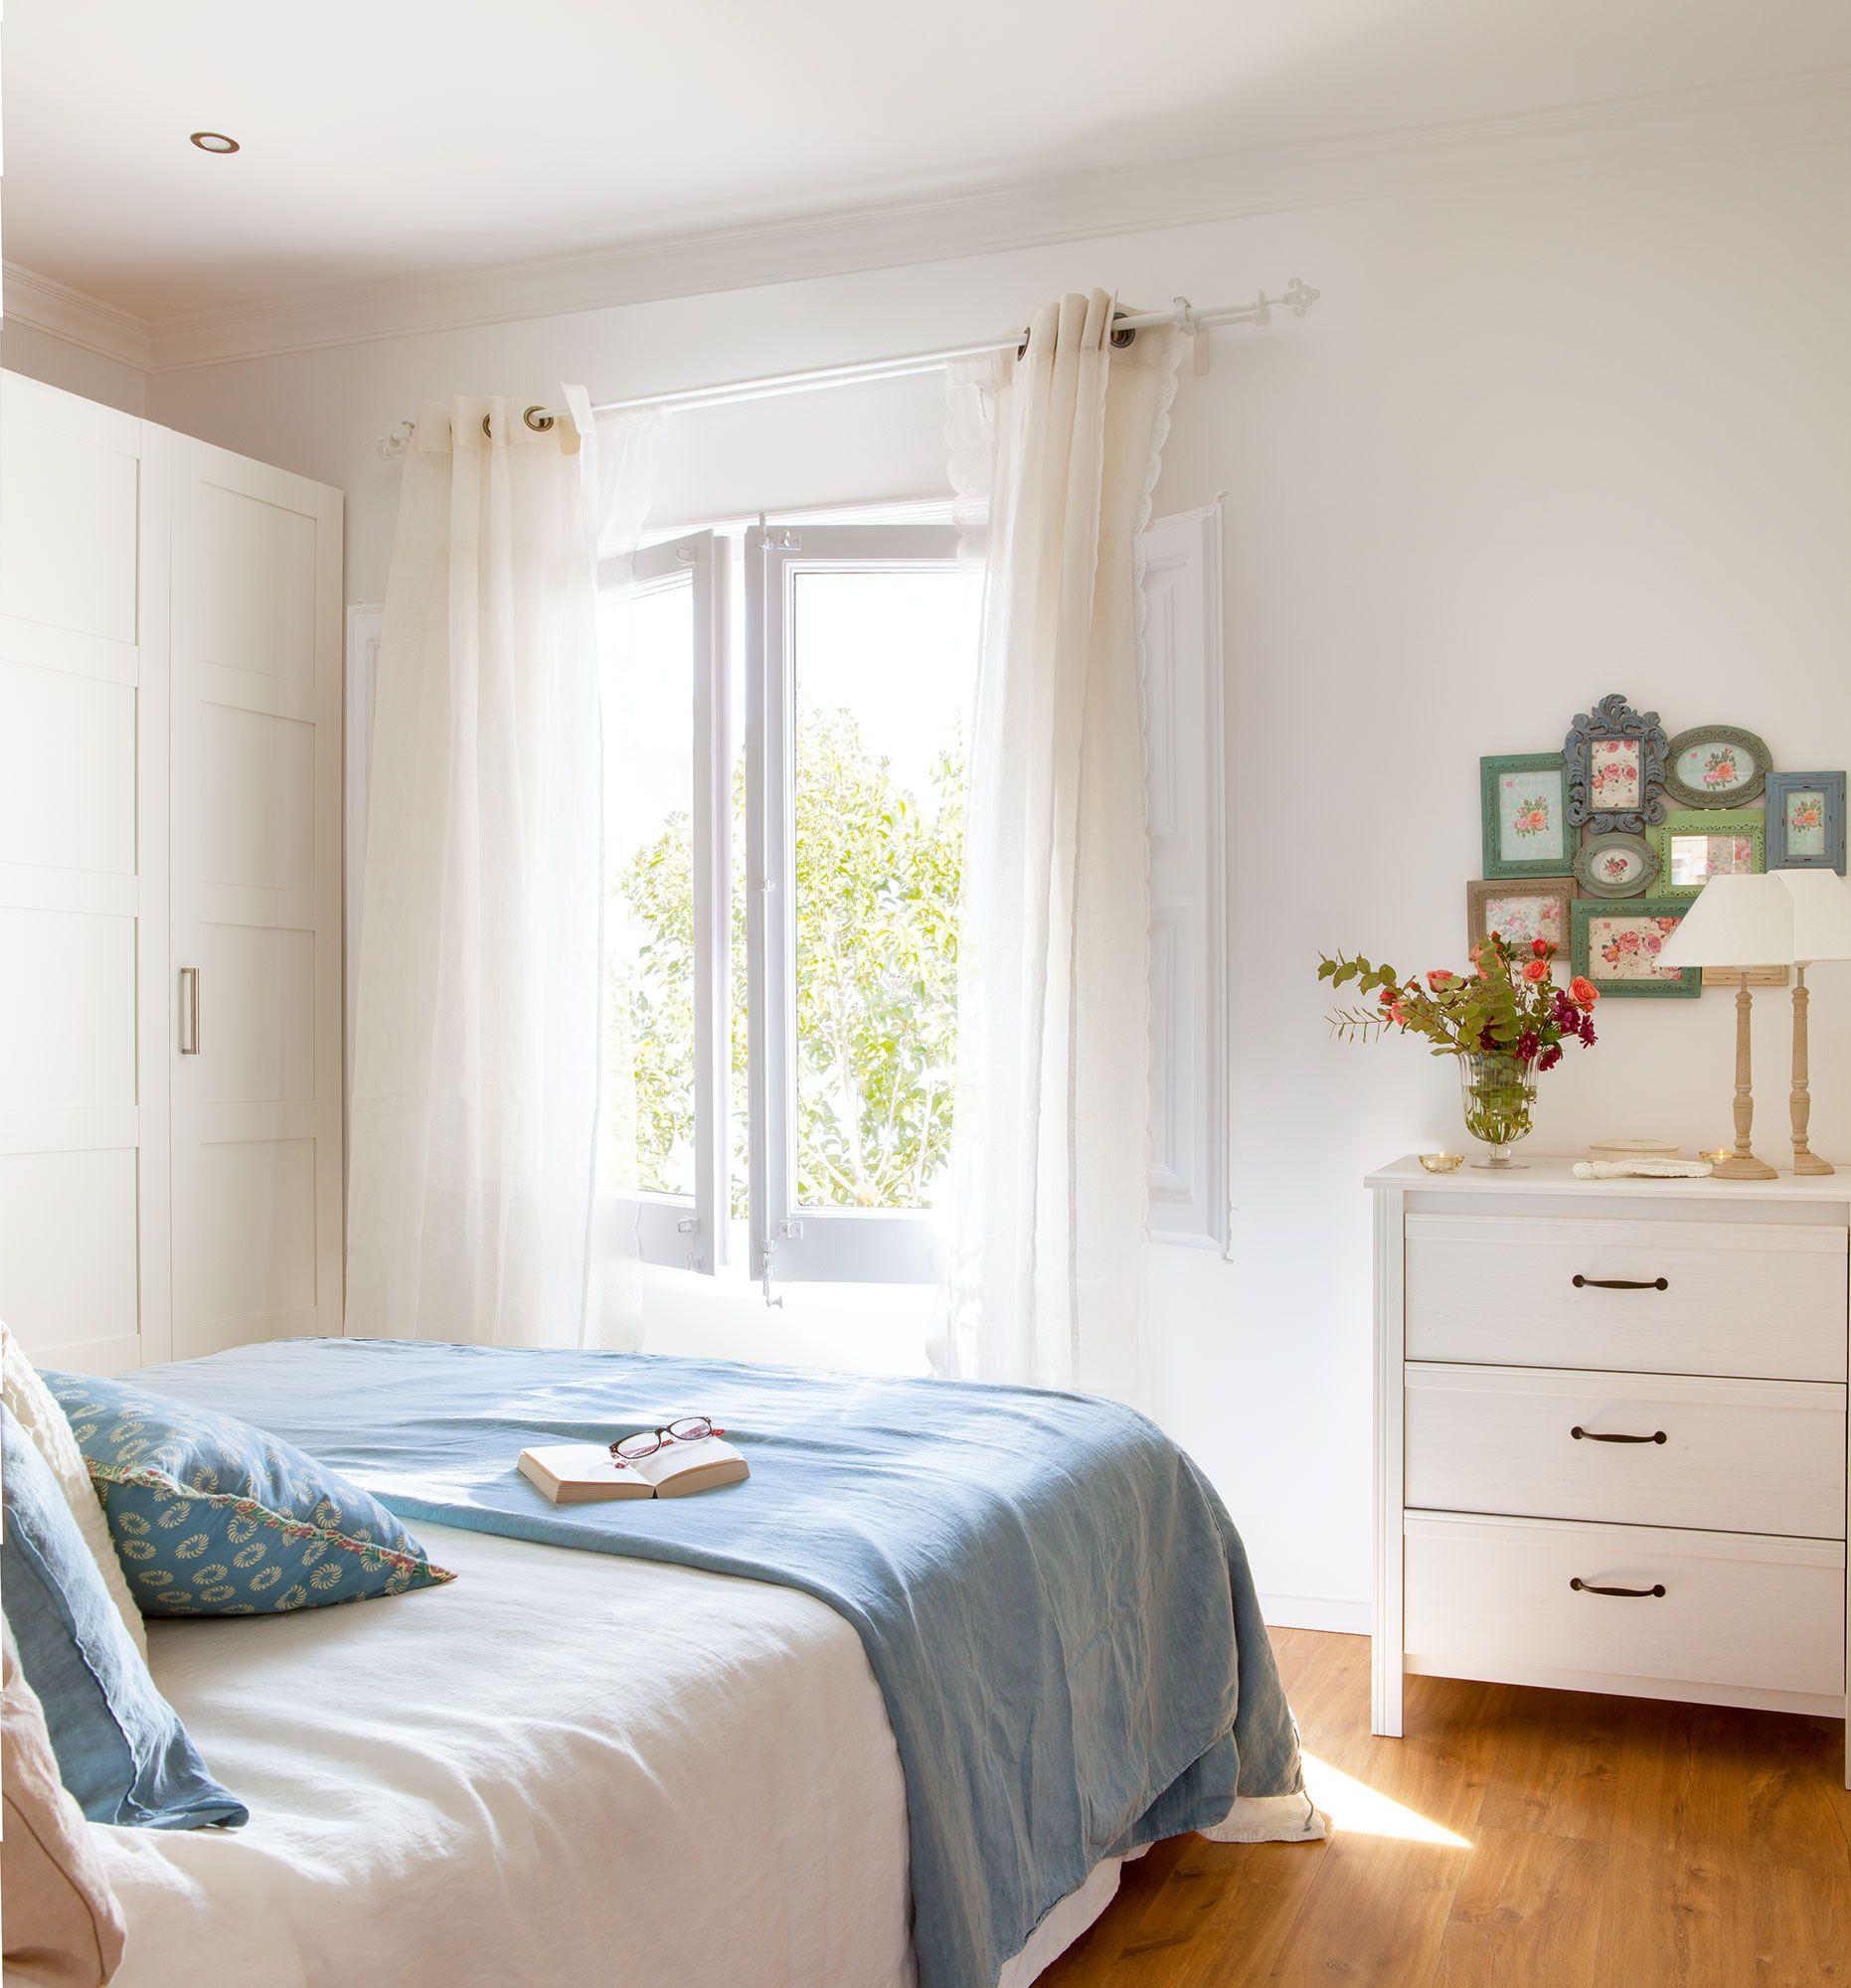 Dormitorio hacia la ventana c moda modelo brusali de ikea - Comodas dormitorio ikea ...